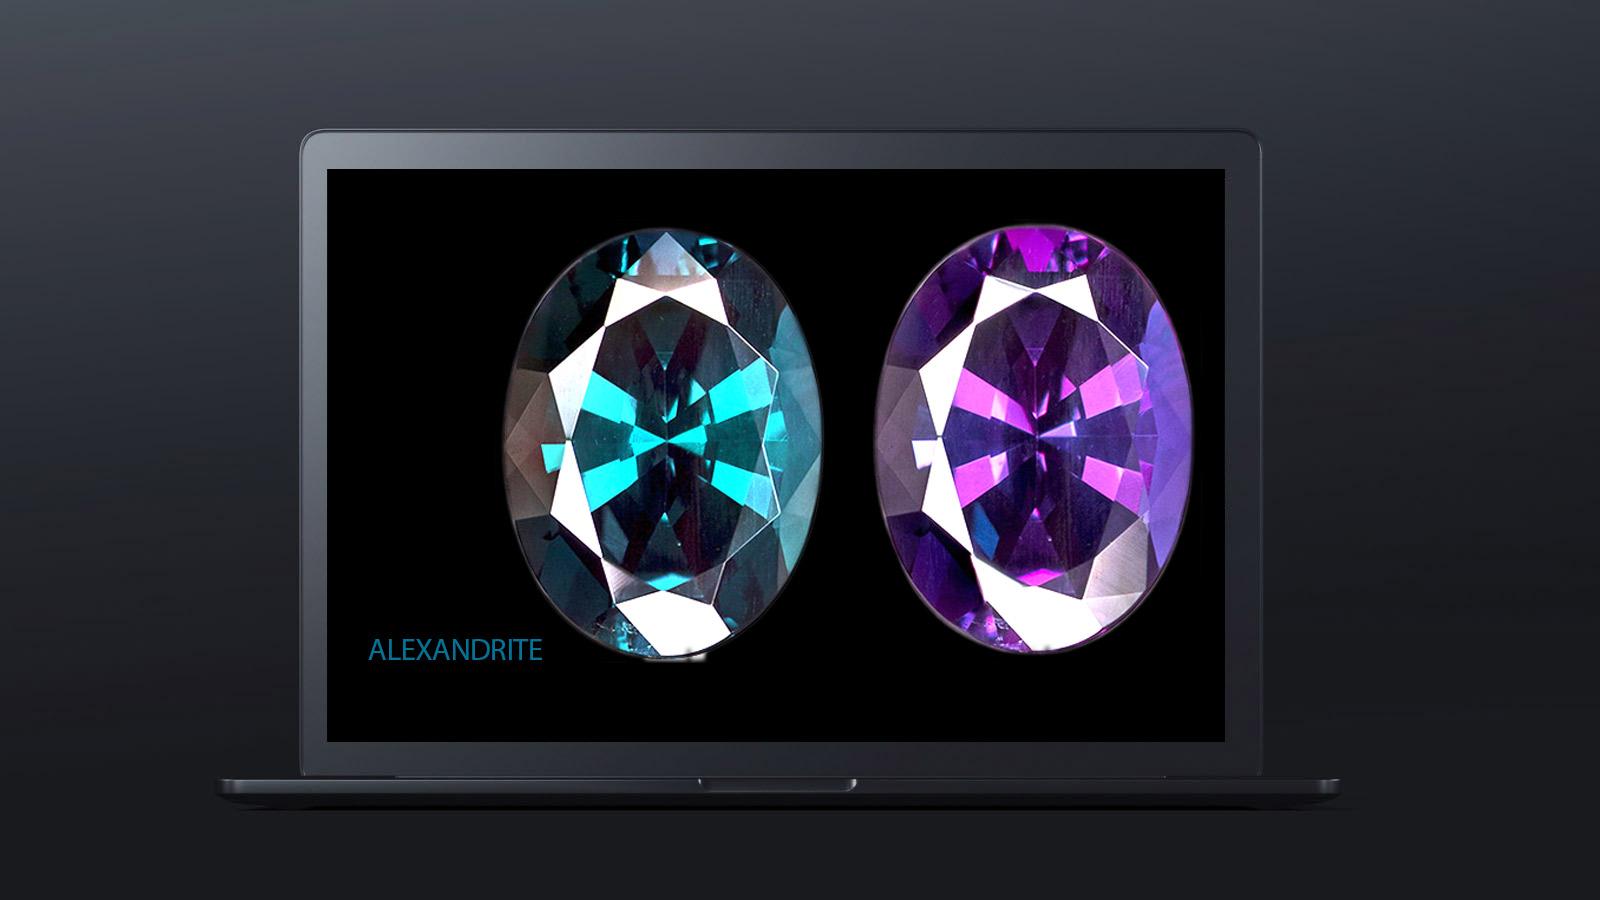 10 worlds rarest gemstones ALEXANDRITE 2jpg - ده گوهر کمیاب دنیا کدامند؟